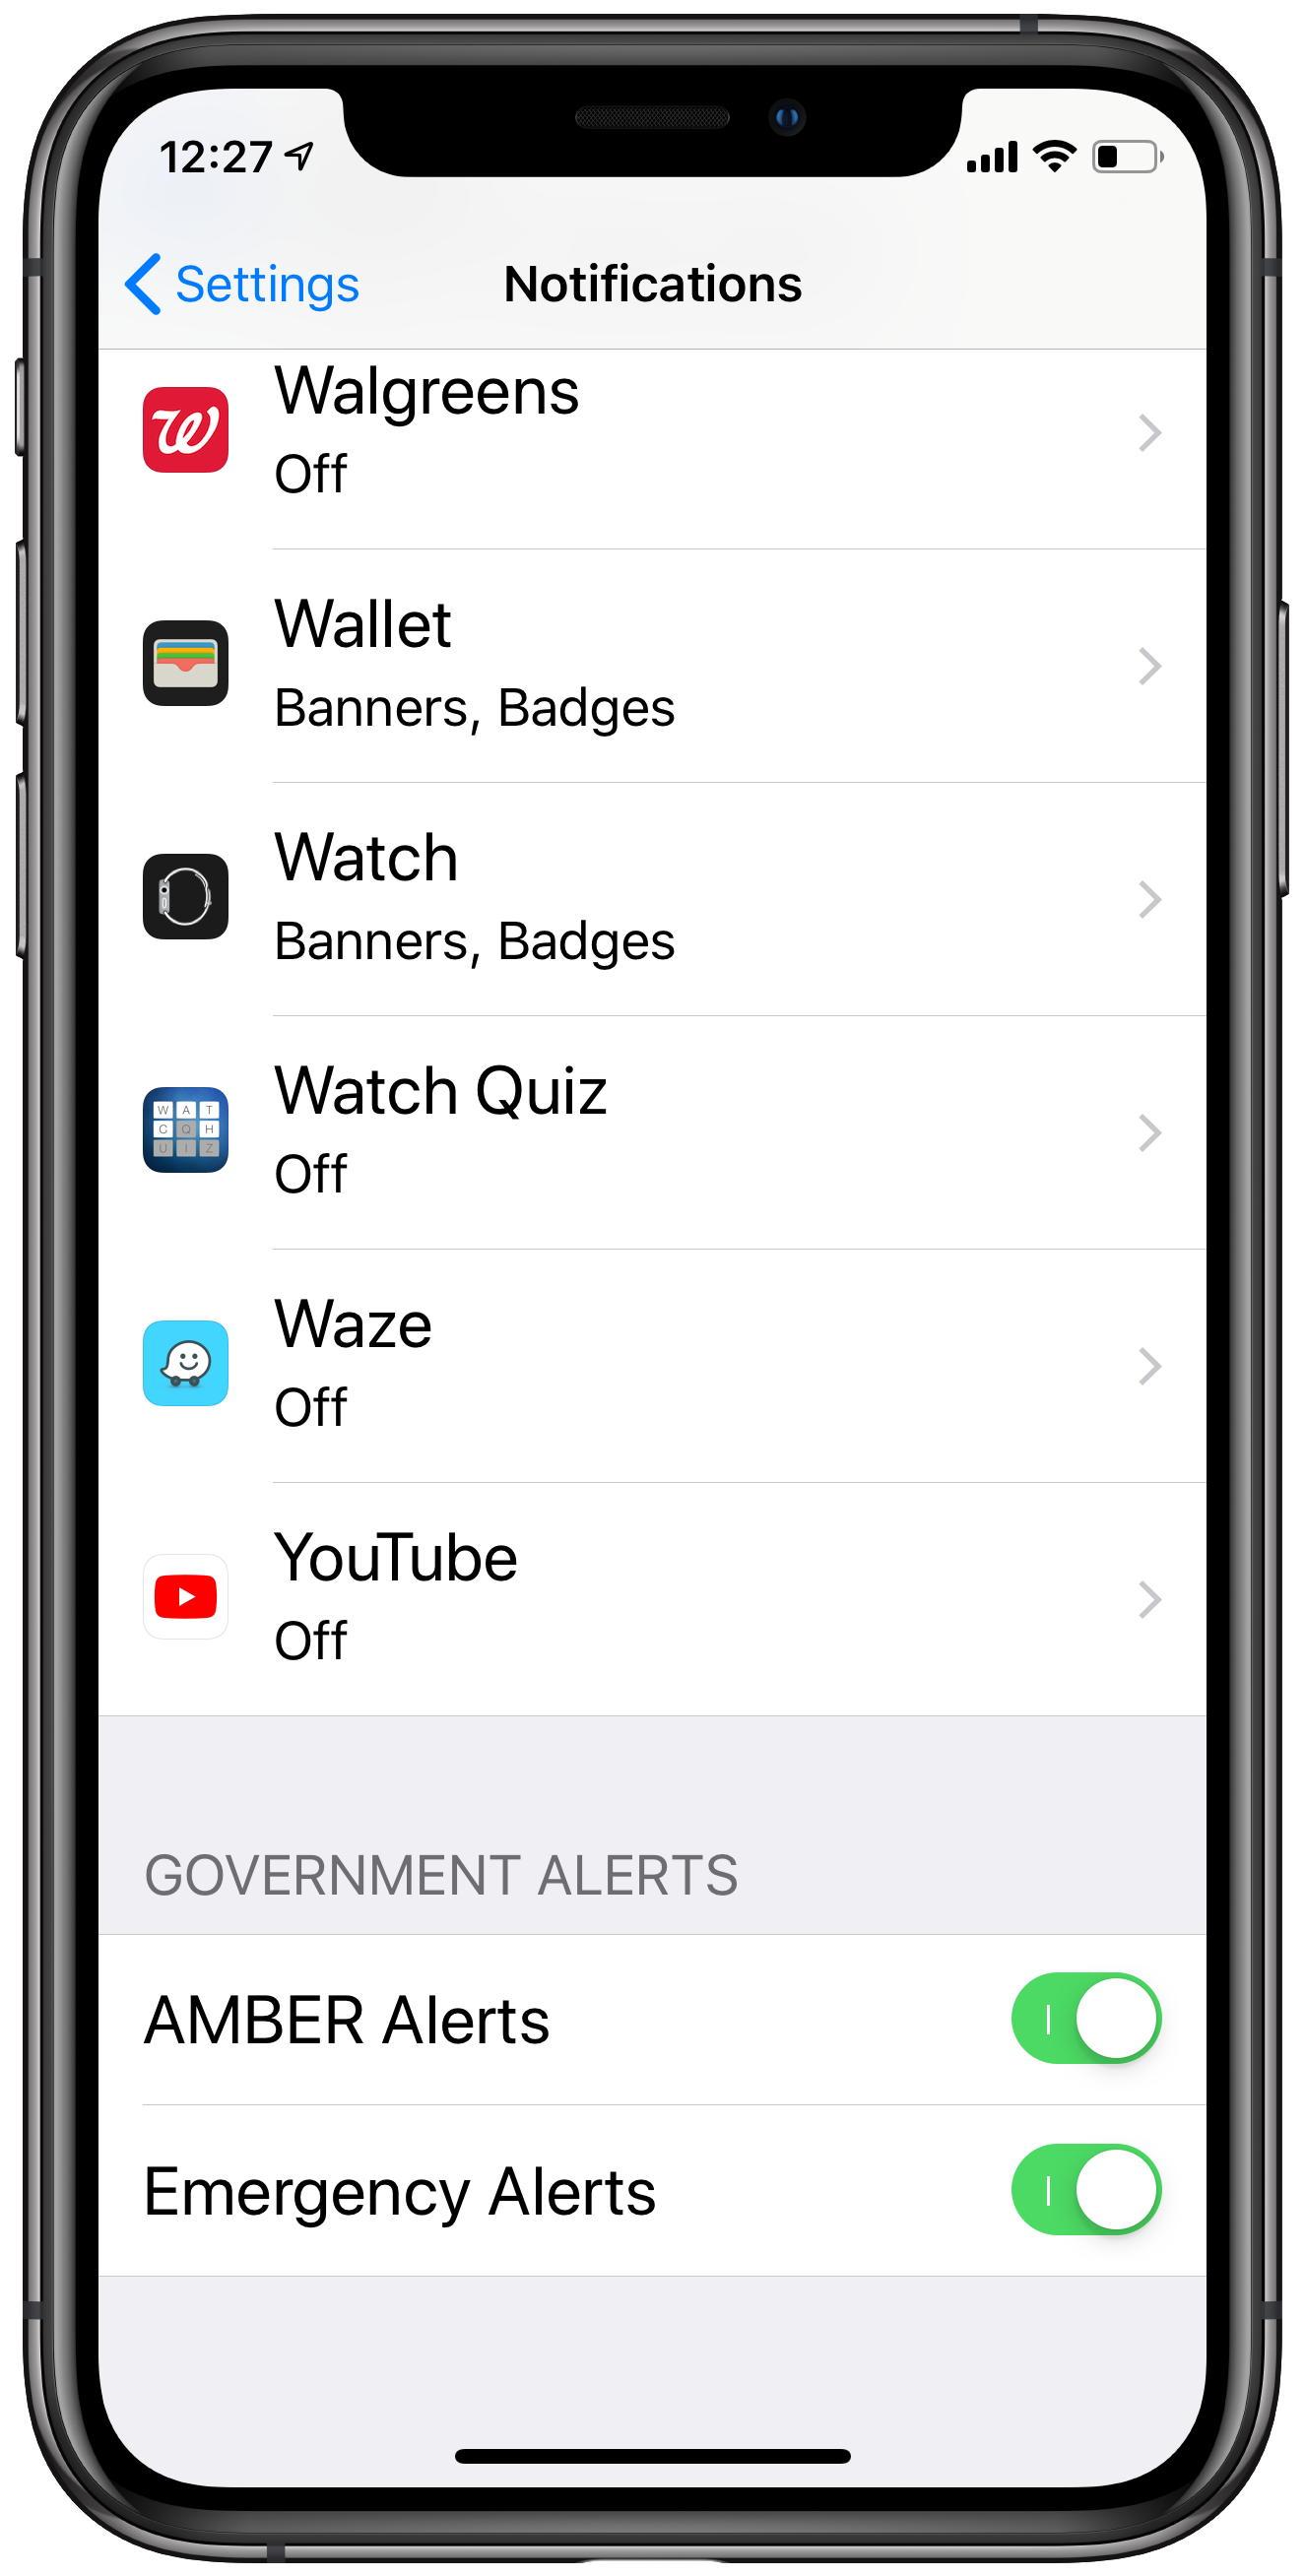 Presidential Alert coming tomorrow, October 3  - iPhone J D